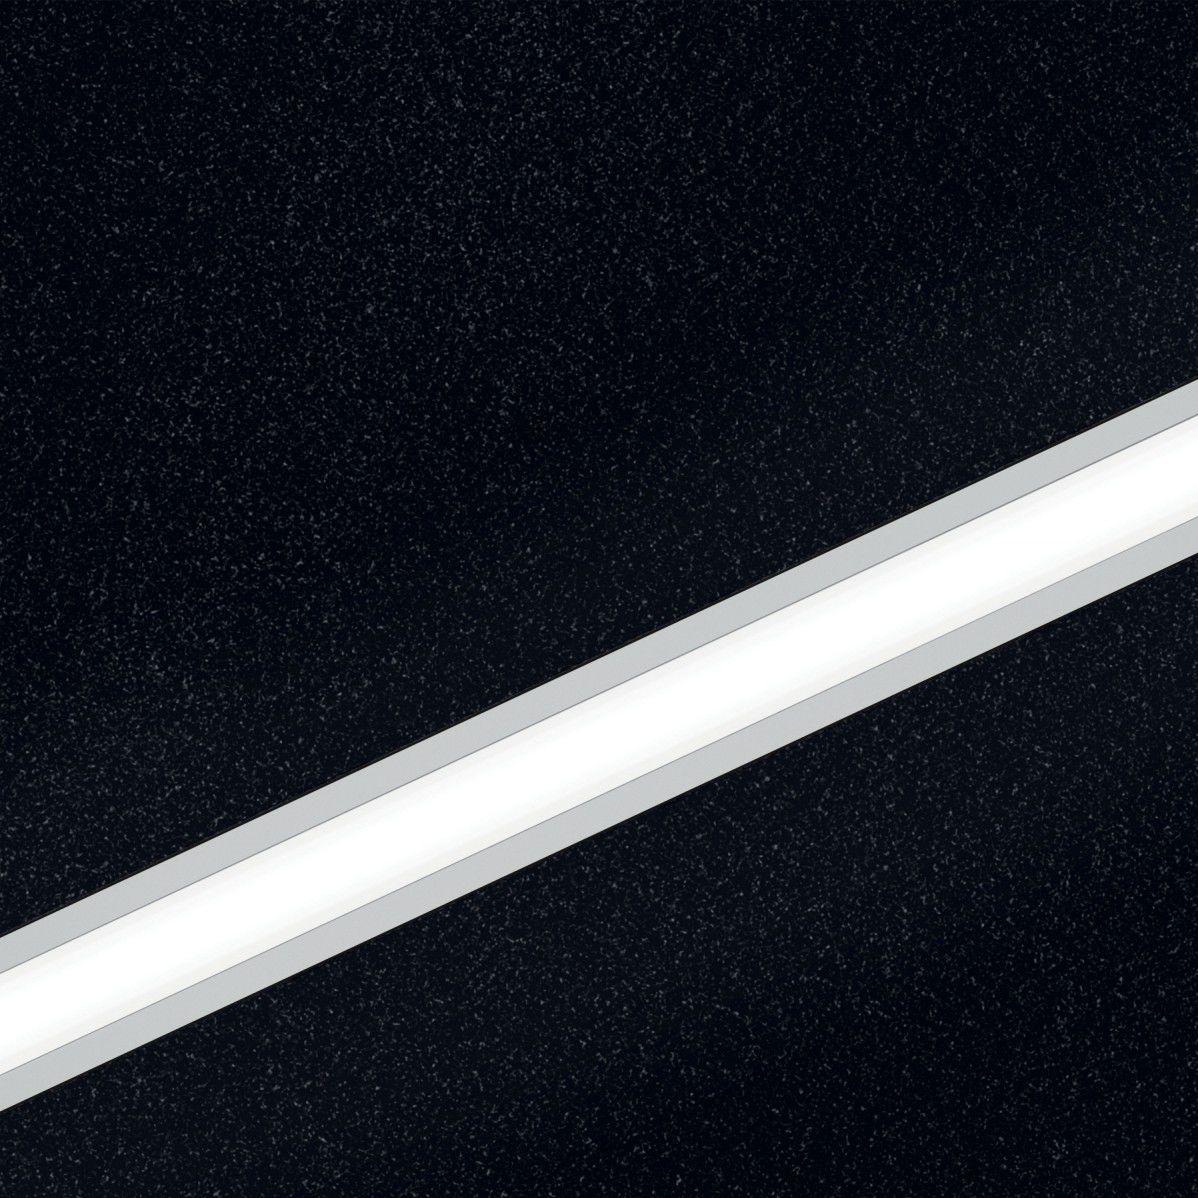 Recessed floor light fixture   LED   linear   outdoor   LUMENFACADE INGROUND  DIRECT VIEWRecessed floor light fixture   LED   linear   outdoor  . Inground Linear Led Lighting. Home Design Ideas